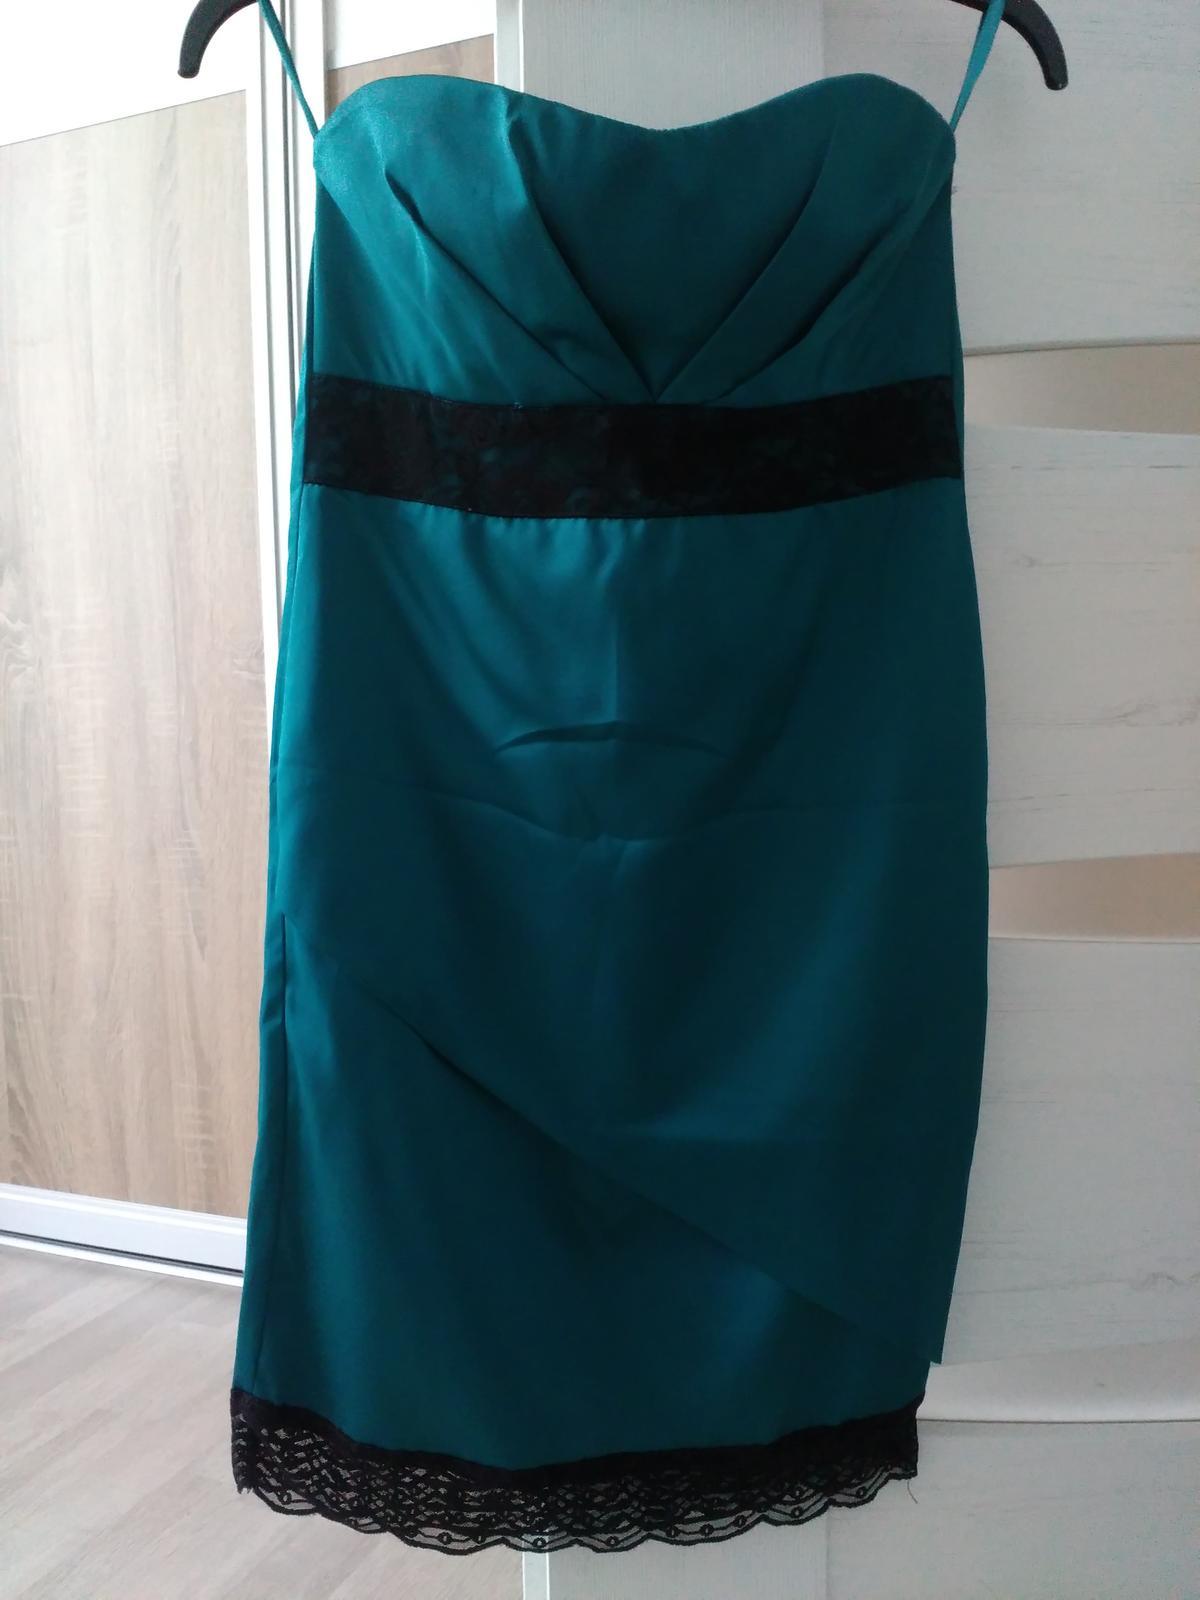 Tmavozelene šaty 34 - Obrázok č. 1